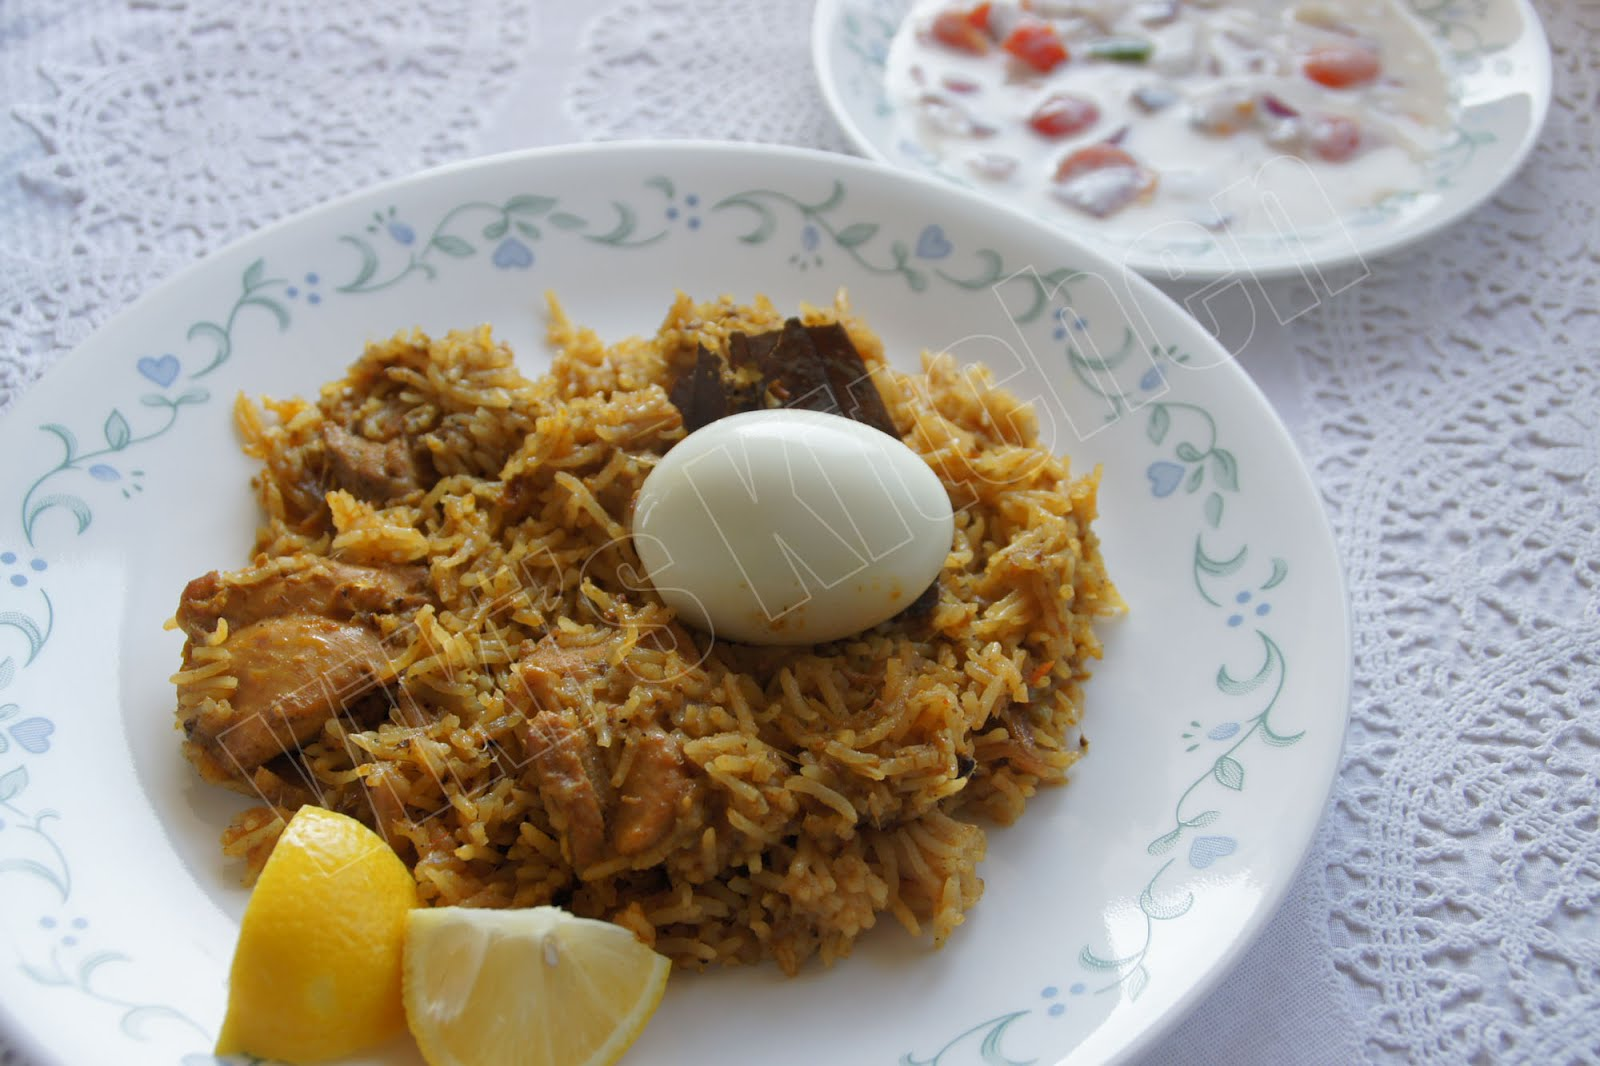 http://4.bp.blogspot.com/-6hzV-D-WXlI/T7fjS-bD3wI/AAAAAAAATY8/XKO9TOspwfI/s1600/chicken+briyani+in+cooker.jpg